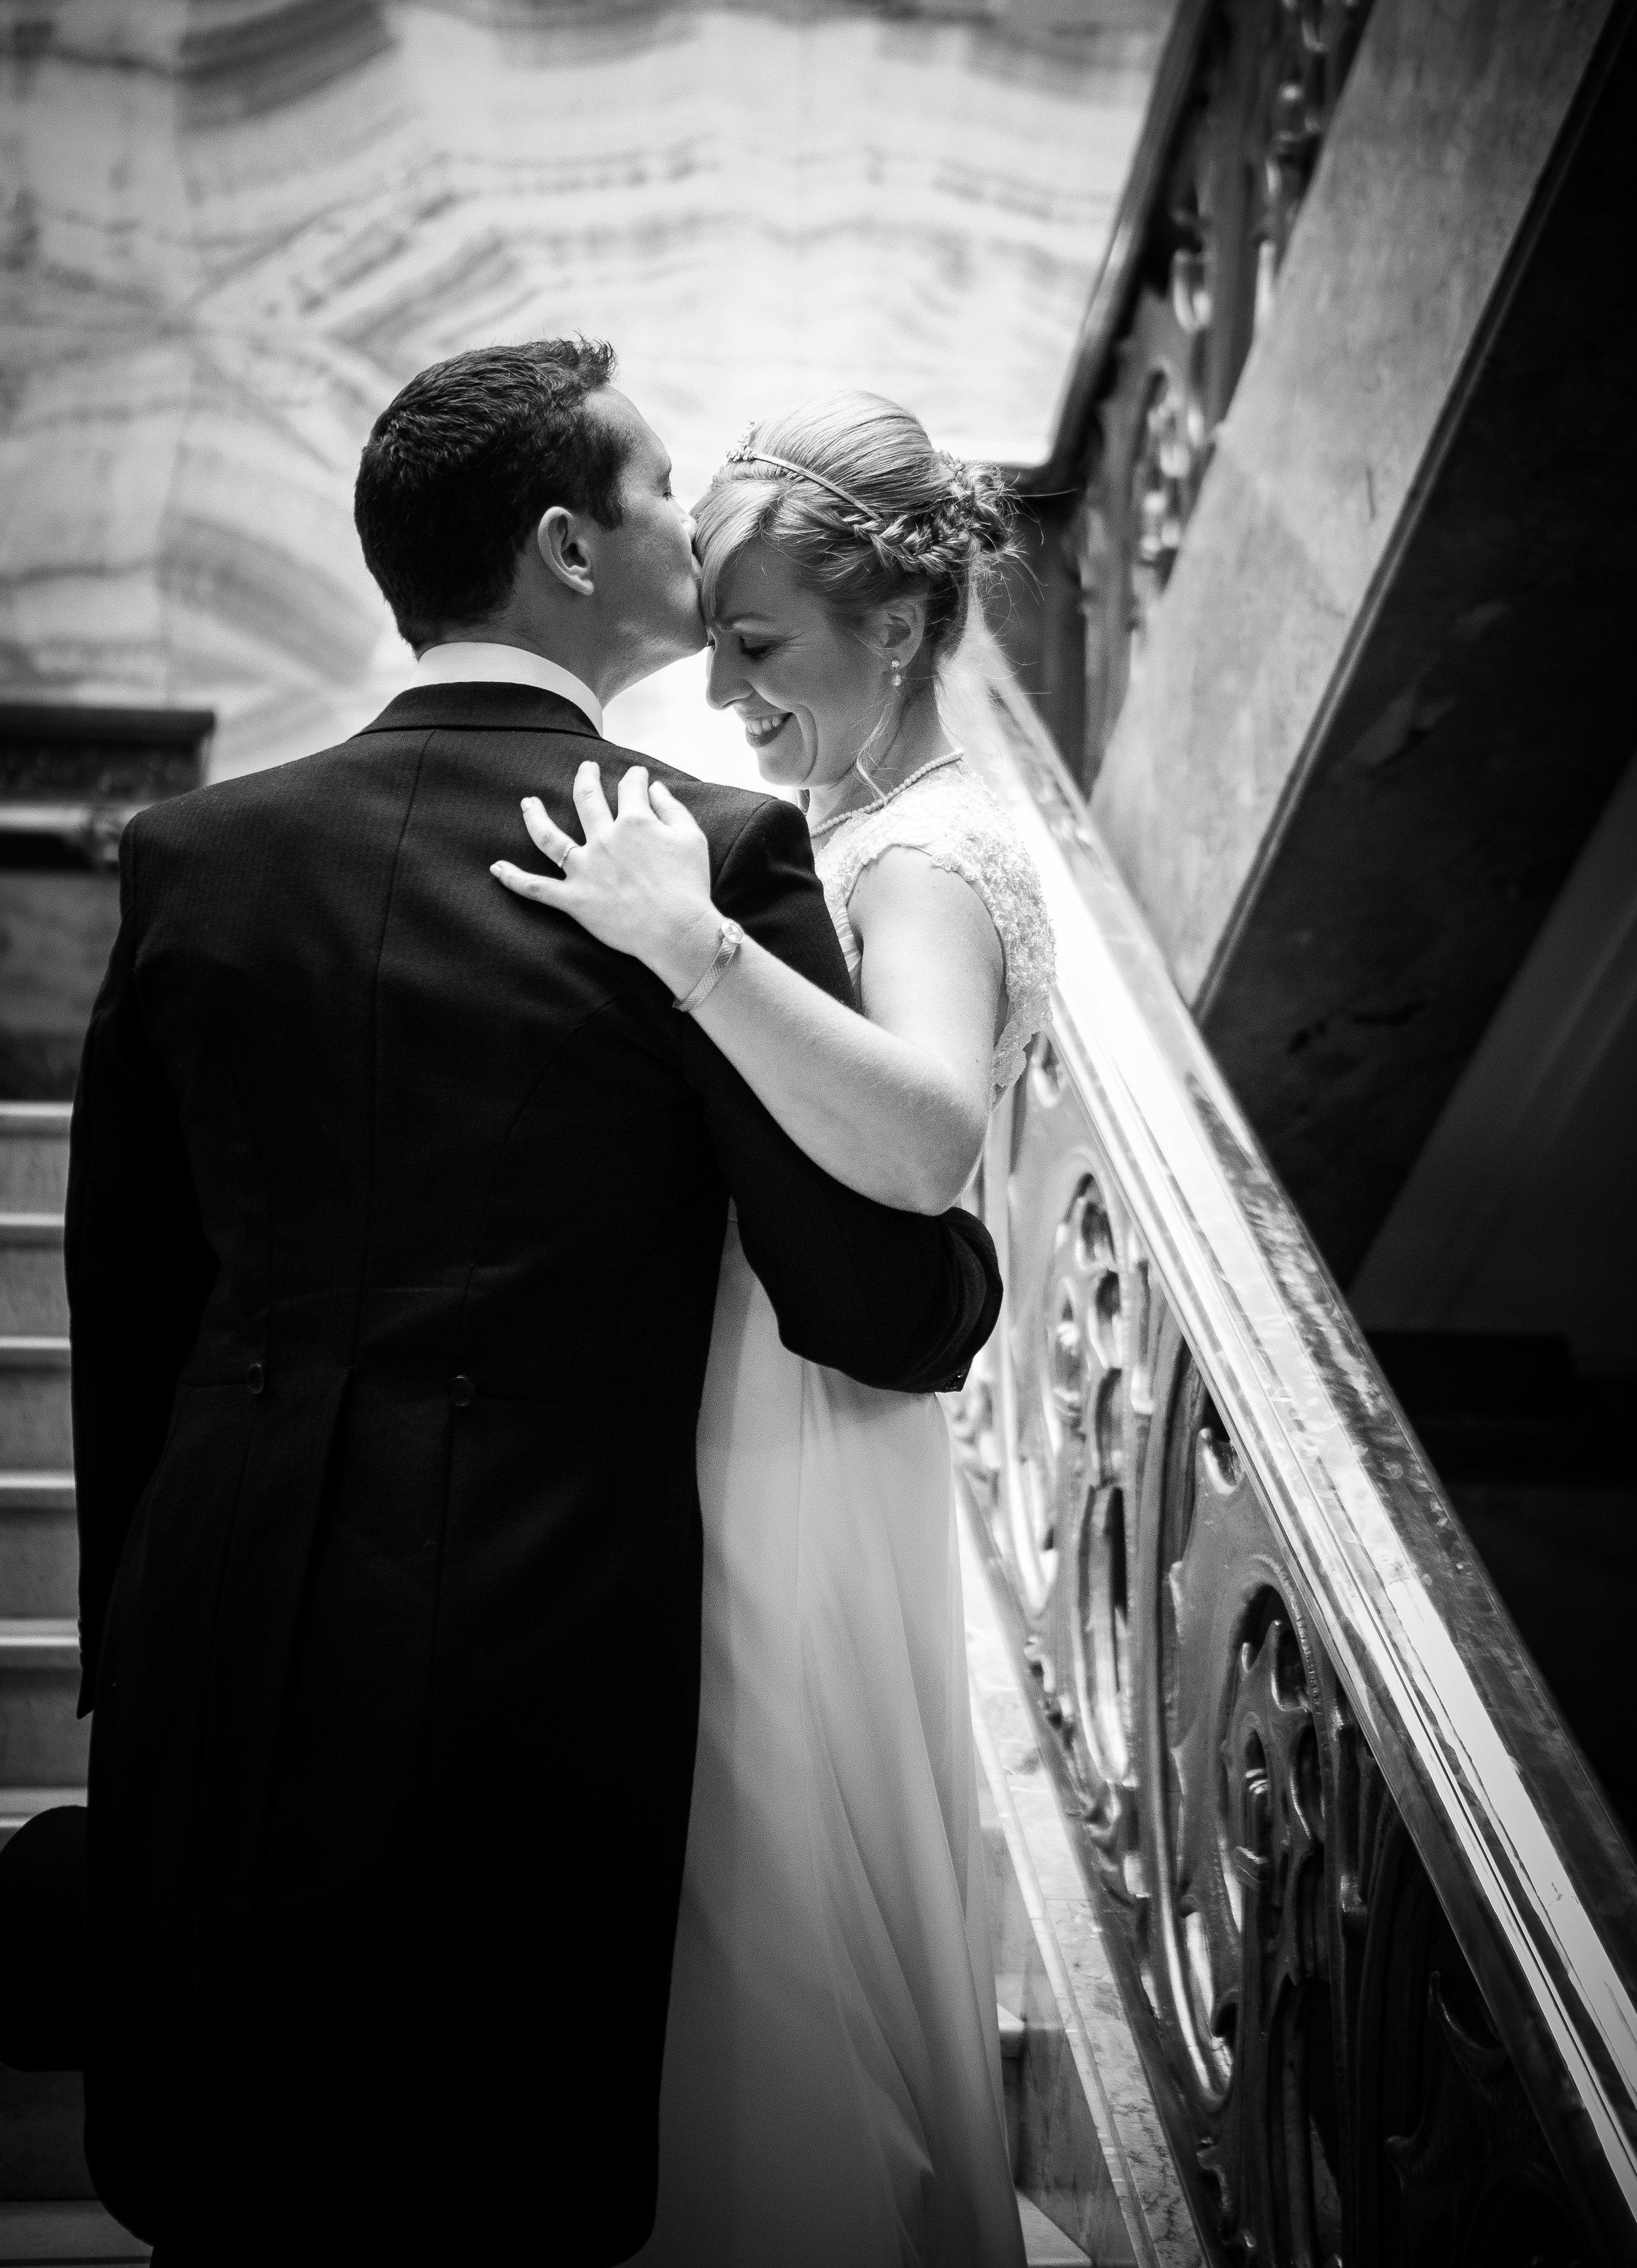 london-wedding-photography-wimbledon-wandsworth-town-hall-savoy-hotel-couple-portrait-56